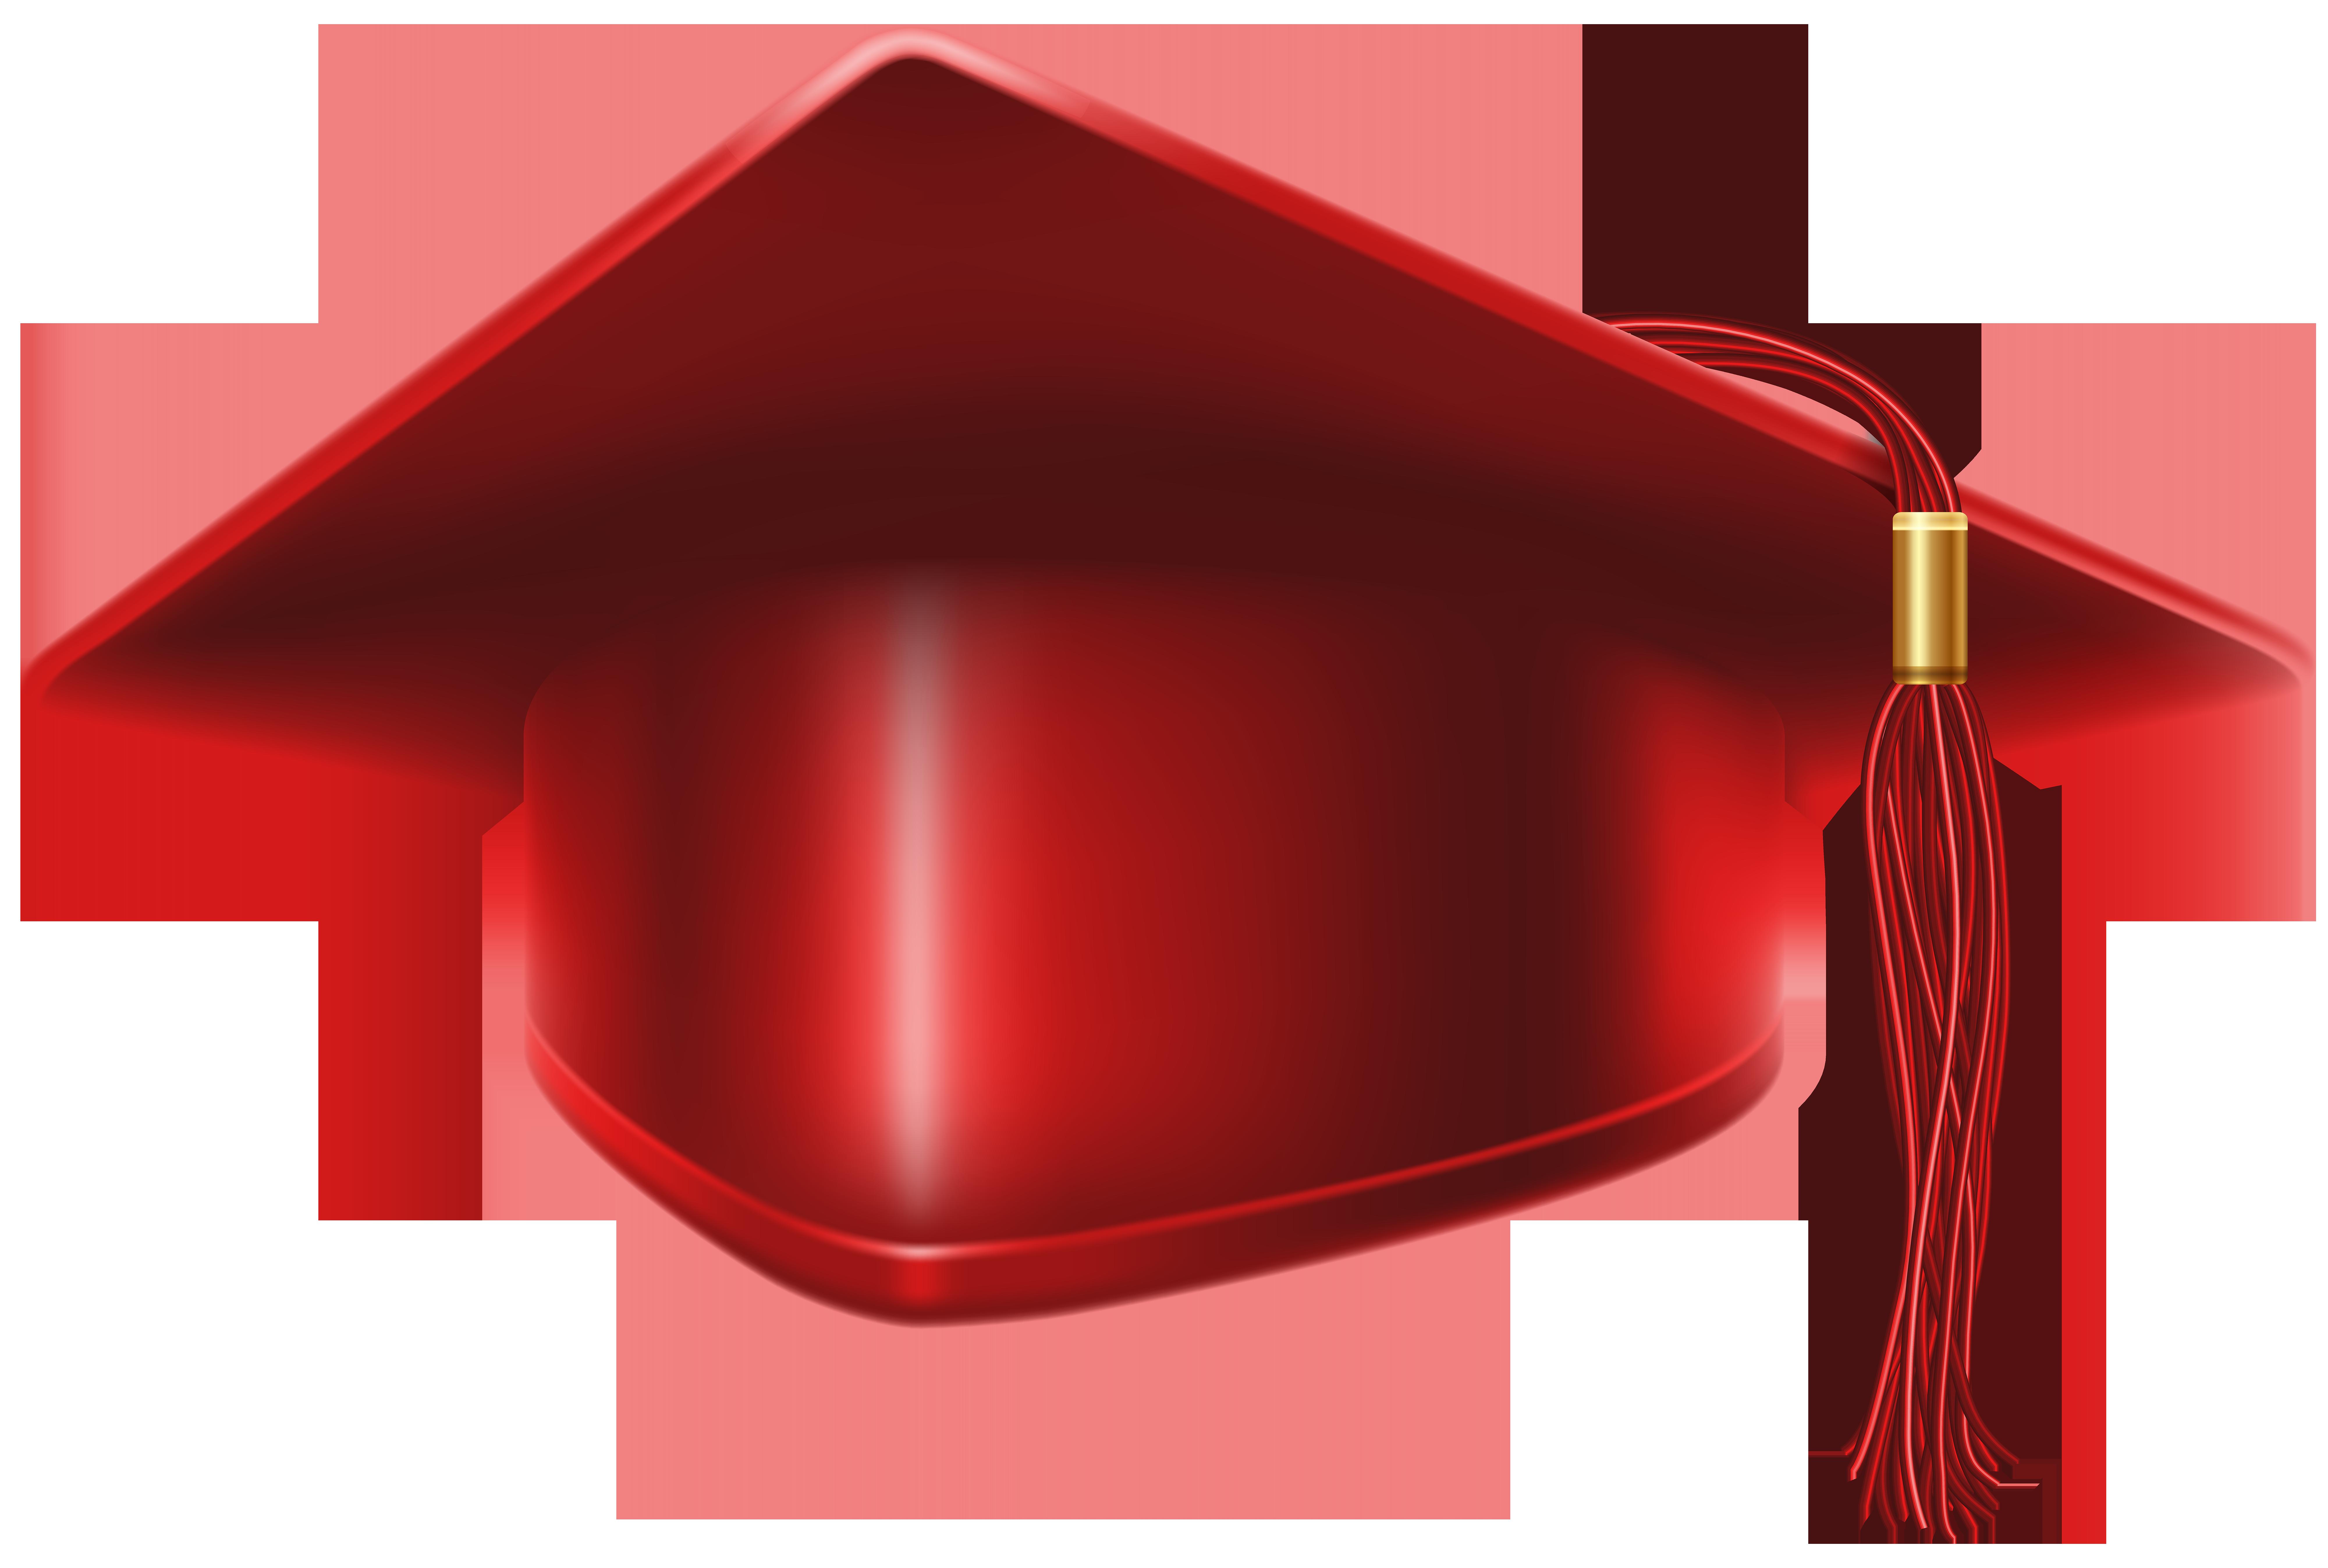 Graduation clipart red clipart transparent library Red Graduation Cap PNG Clip Art Image | Gallery Yopriceville - High ... clipart transparent library